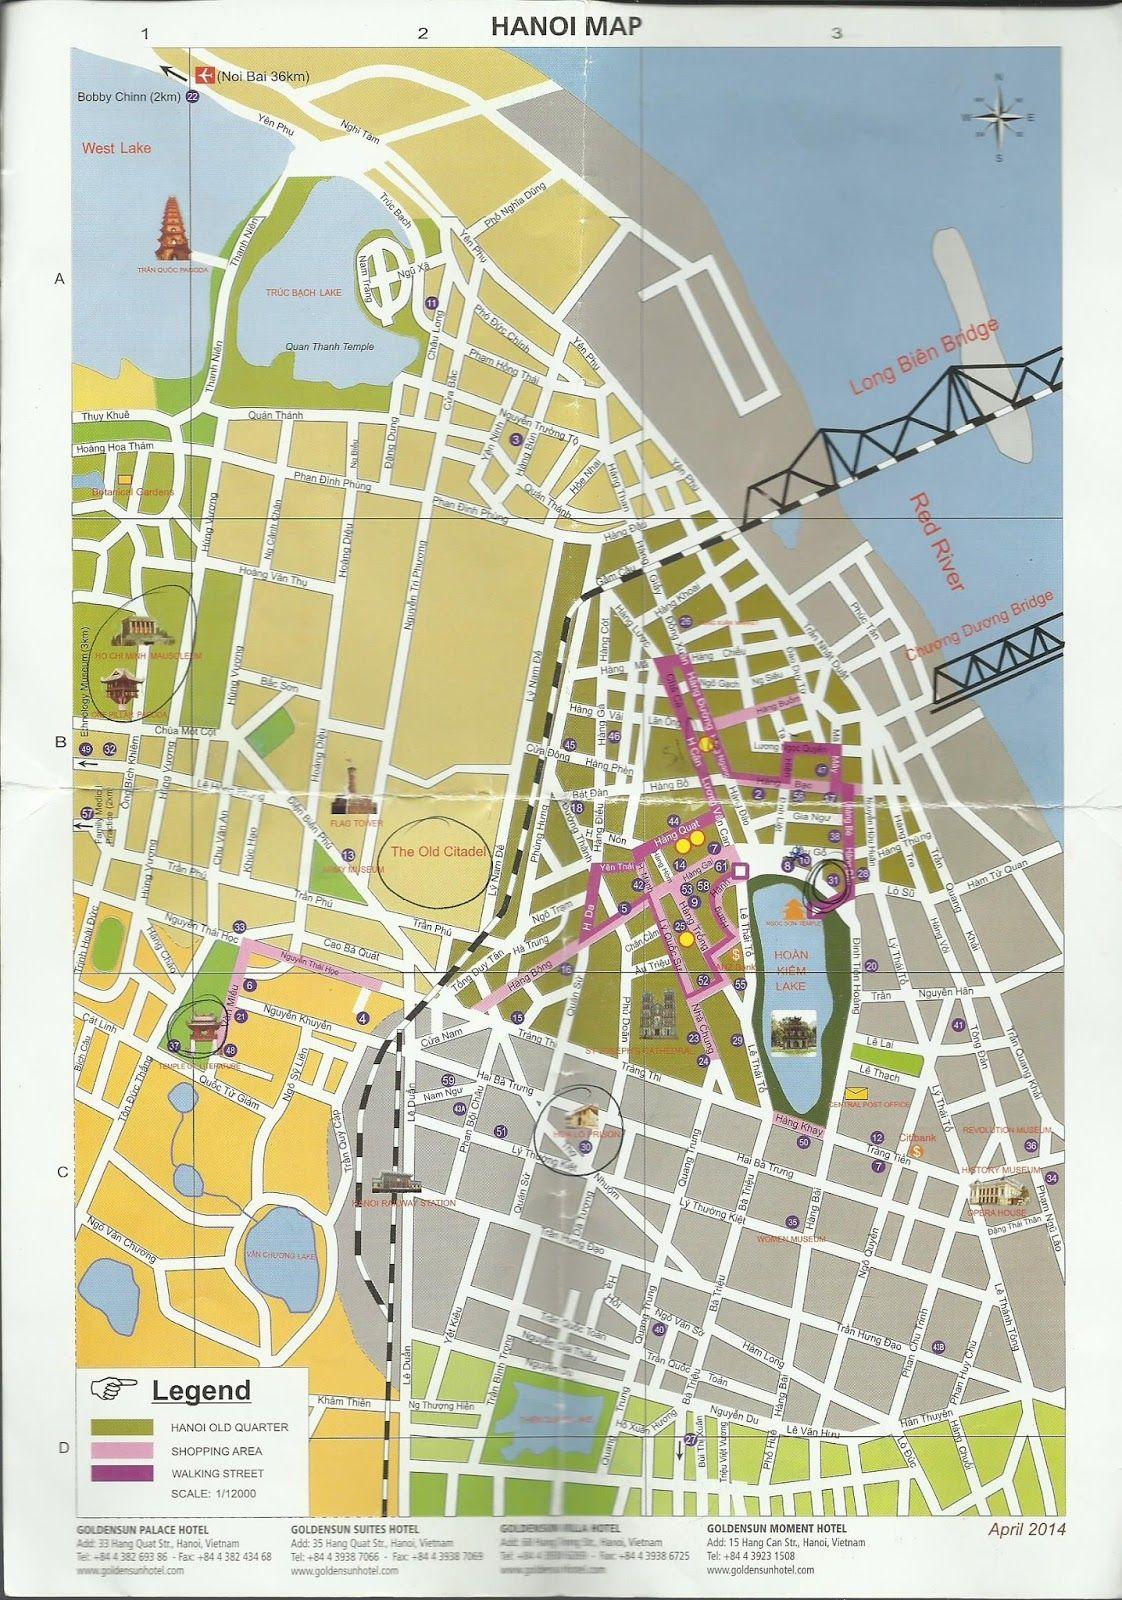 Hanoi Tourist Map Vietnam